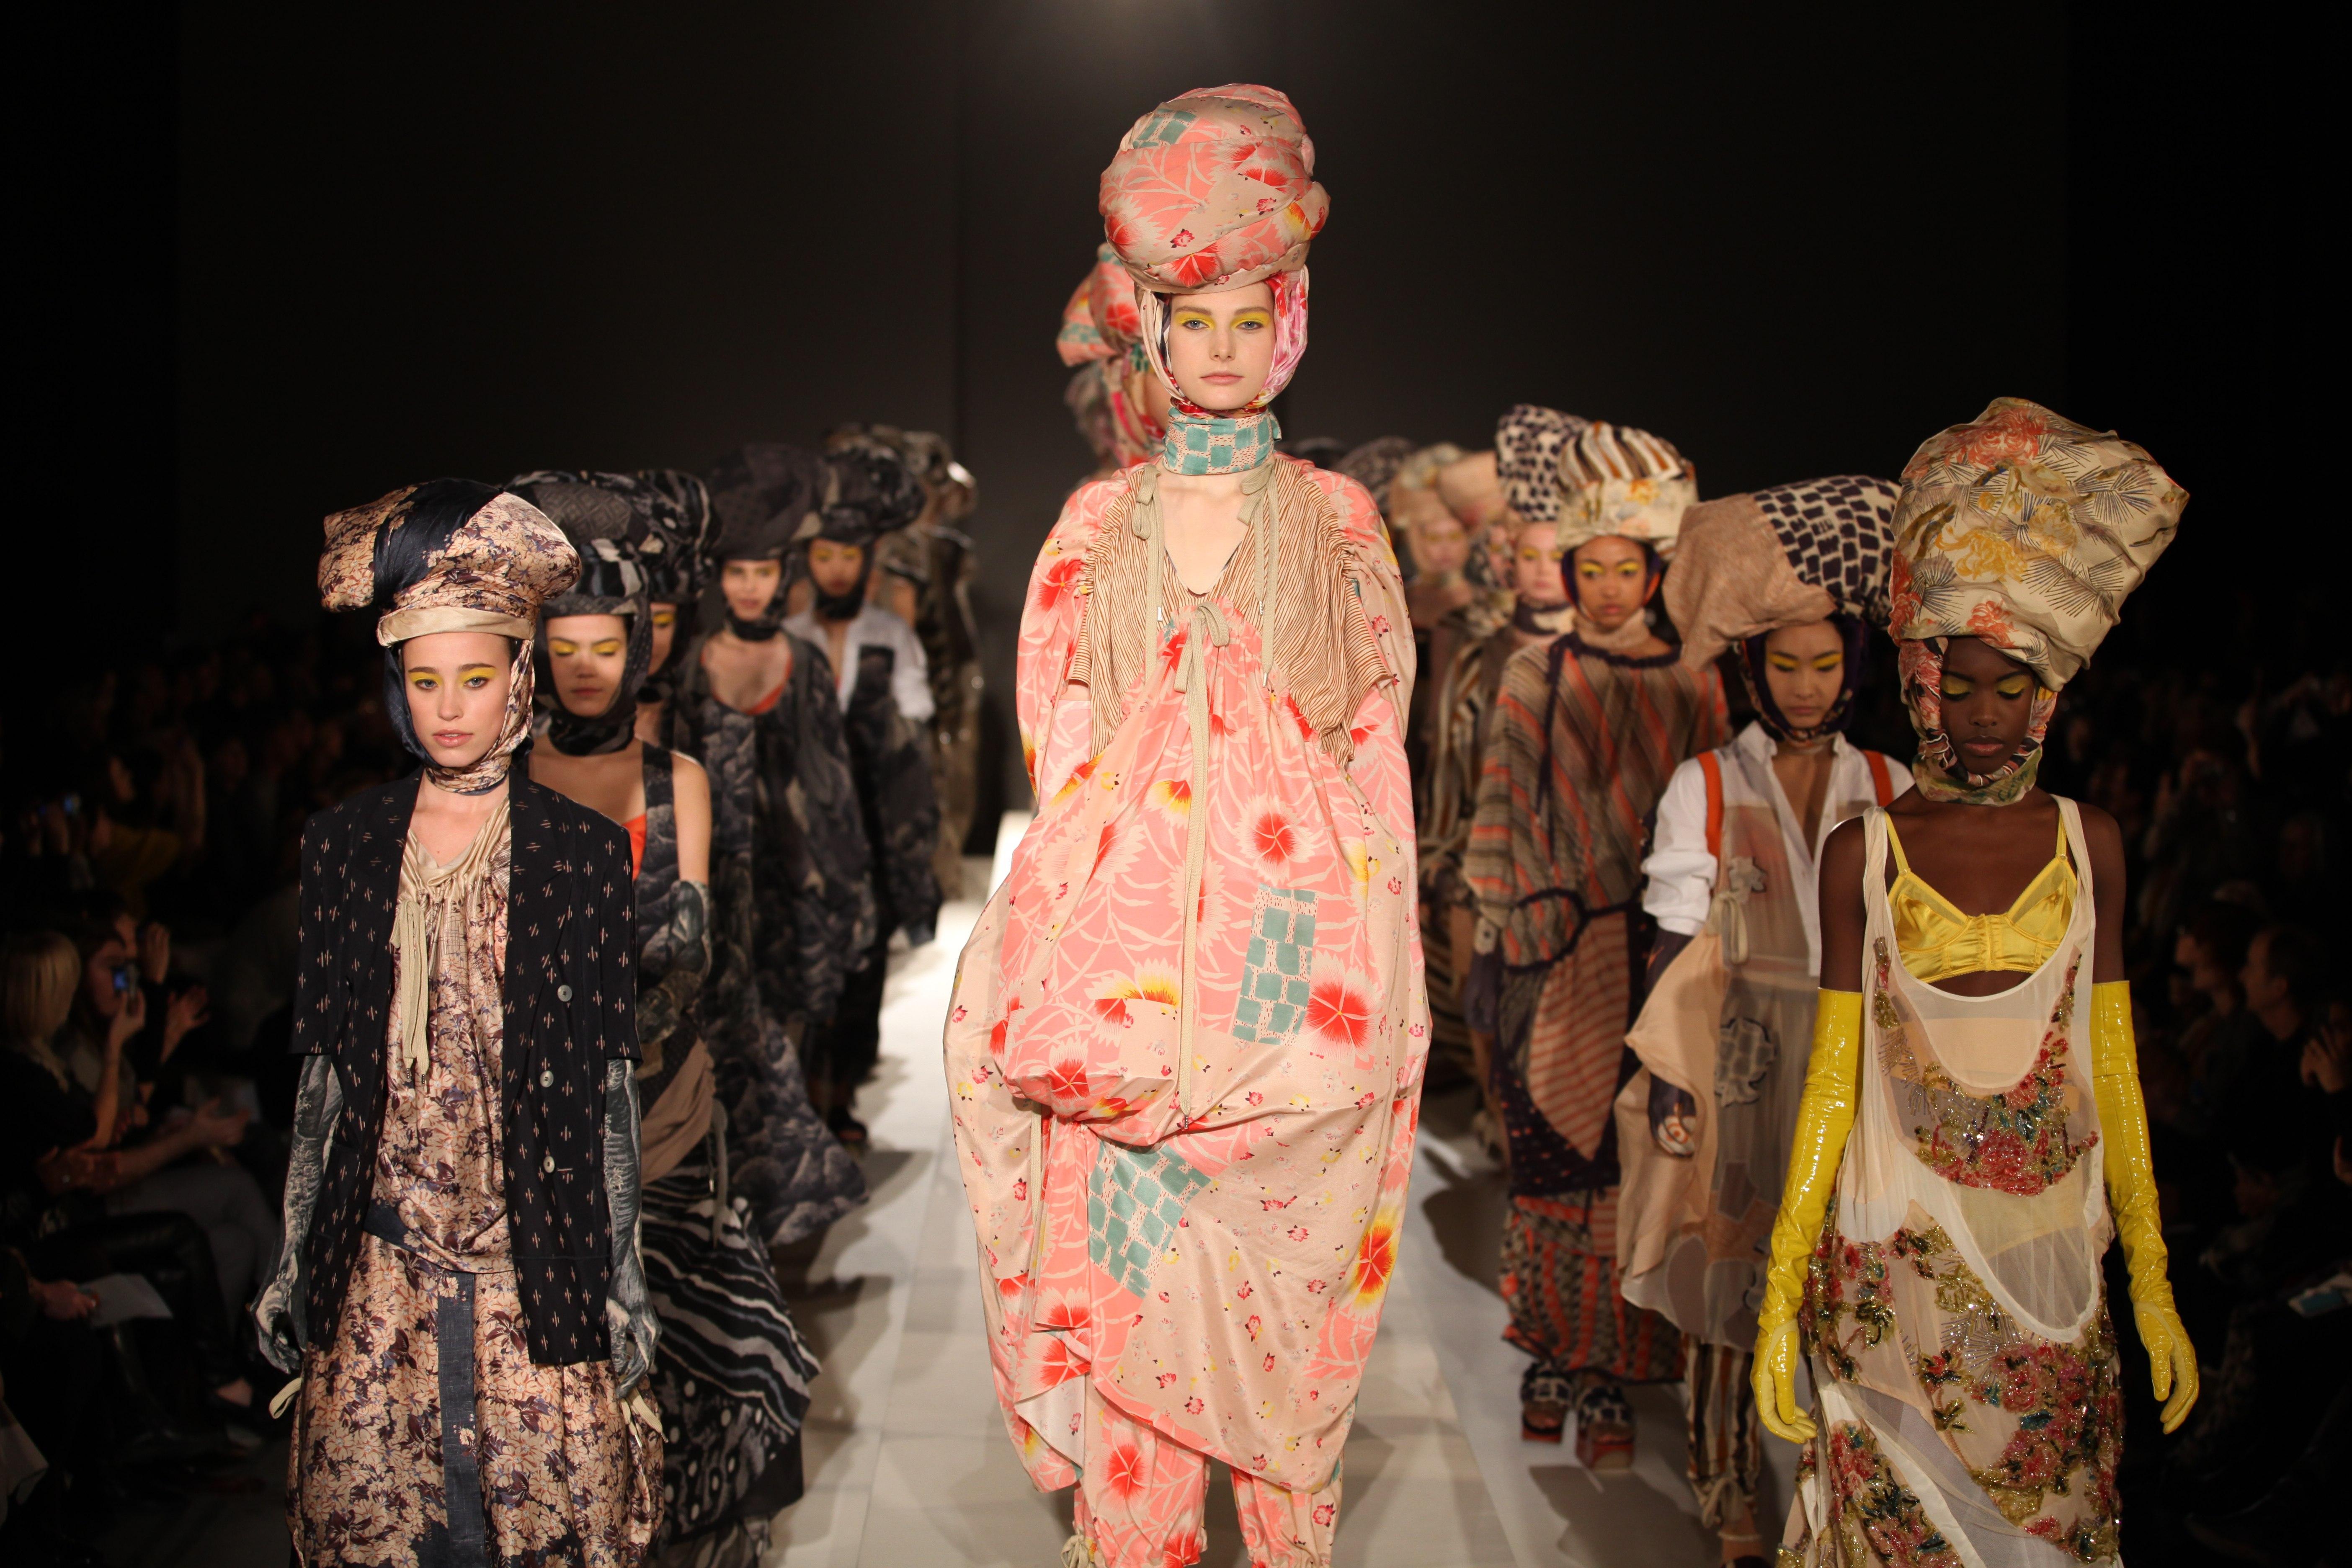 Fashion style via antonio panizzi